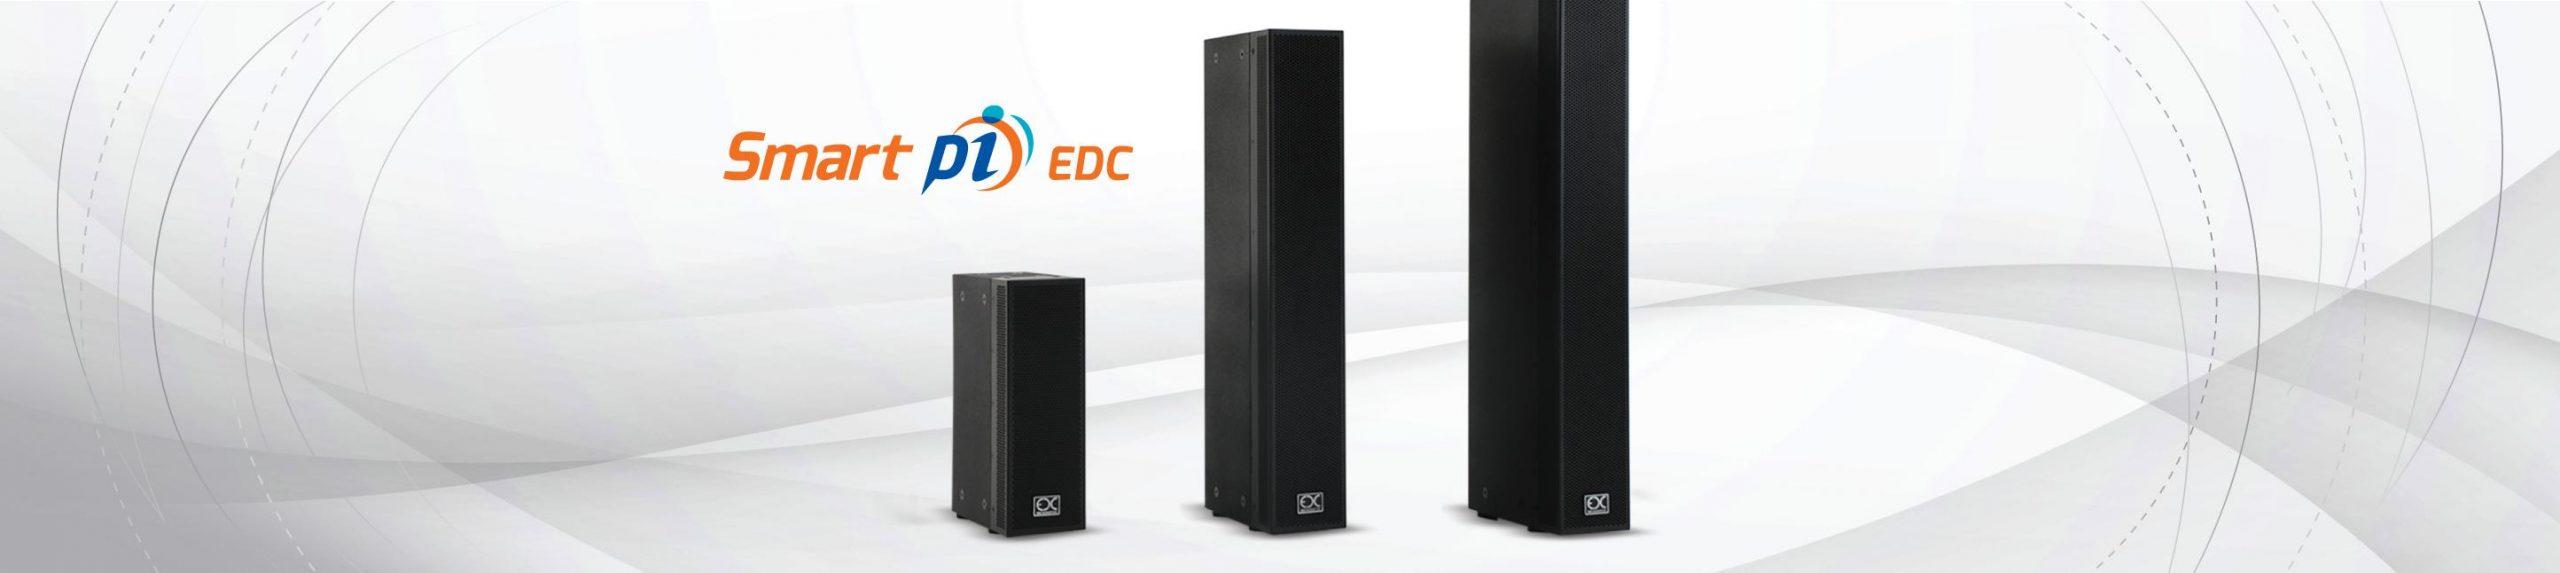 Smart pi EDC